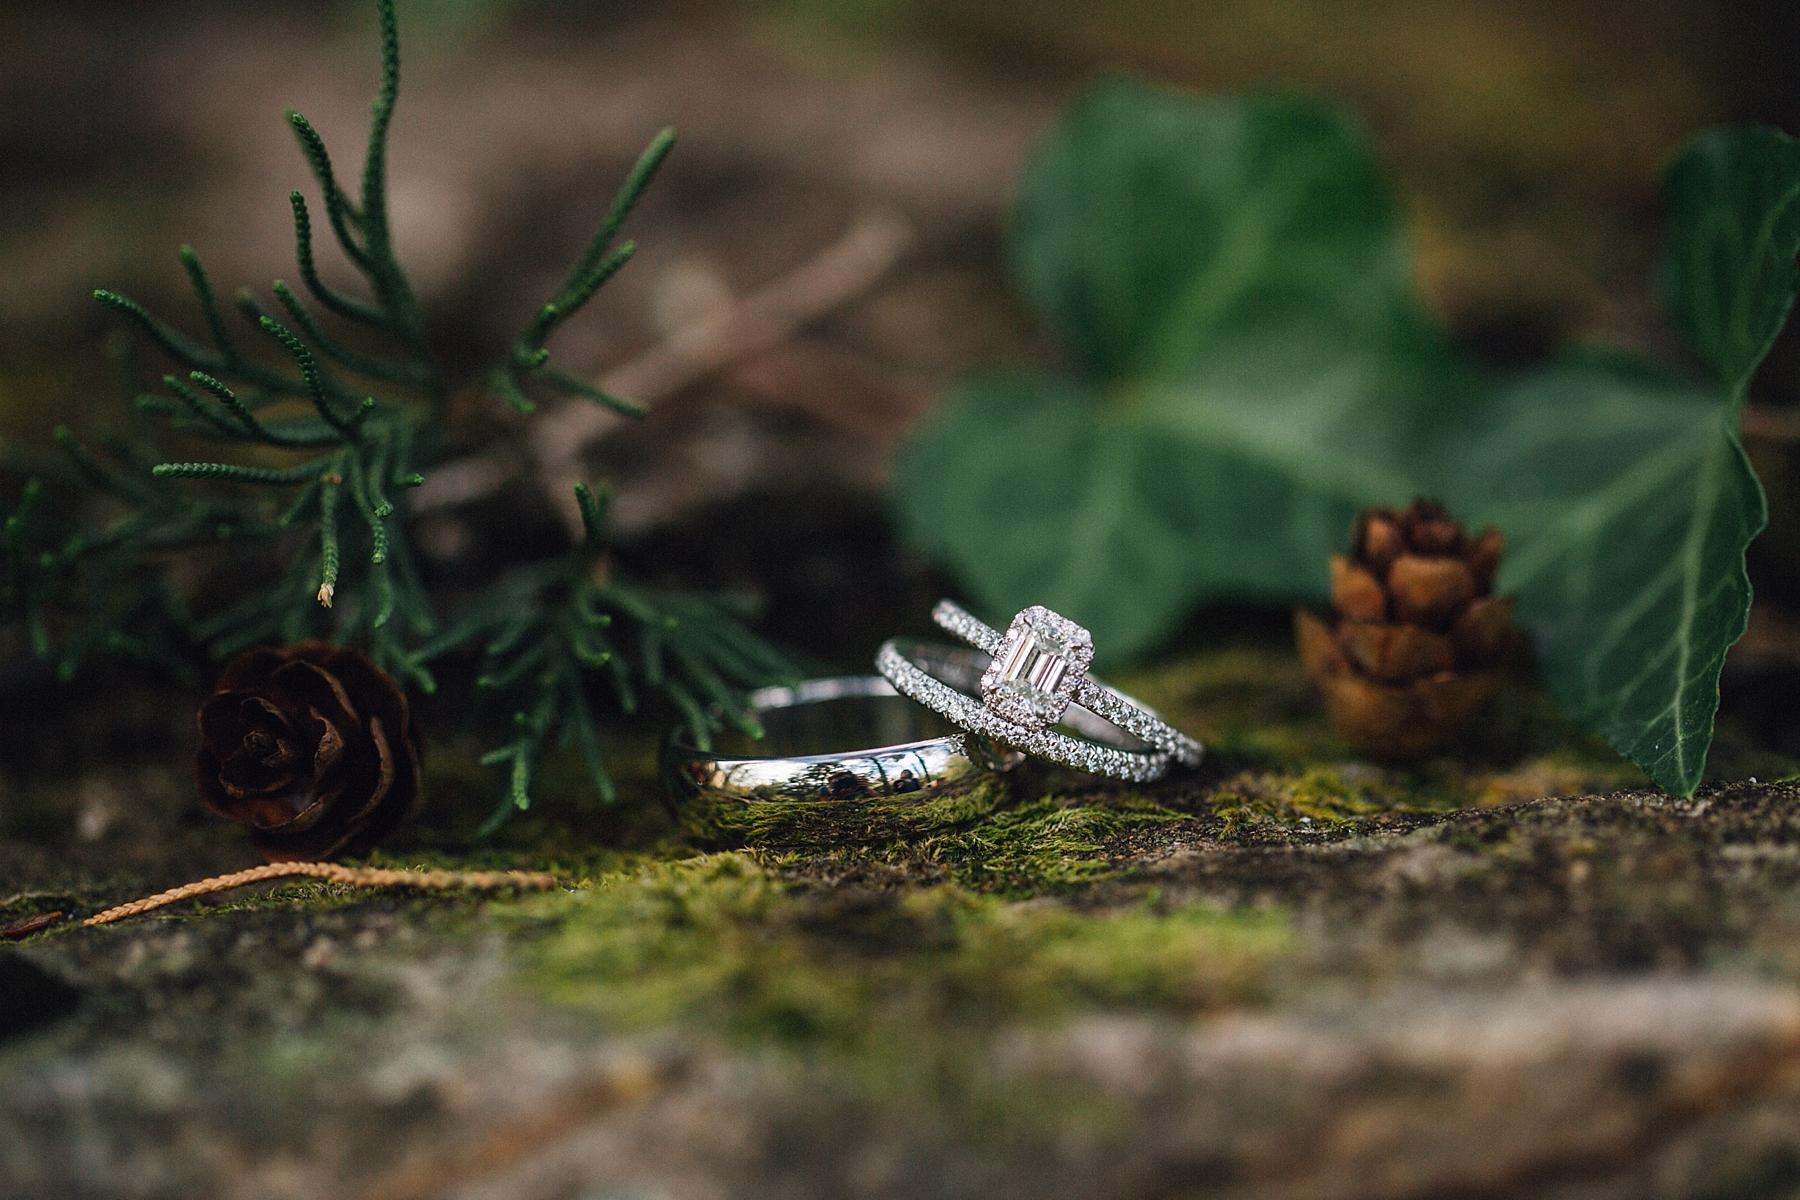 holly-hedge-estate-wedding-weekend-pa-photographer_0004.jpg